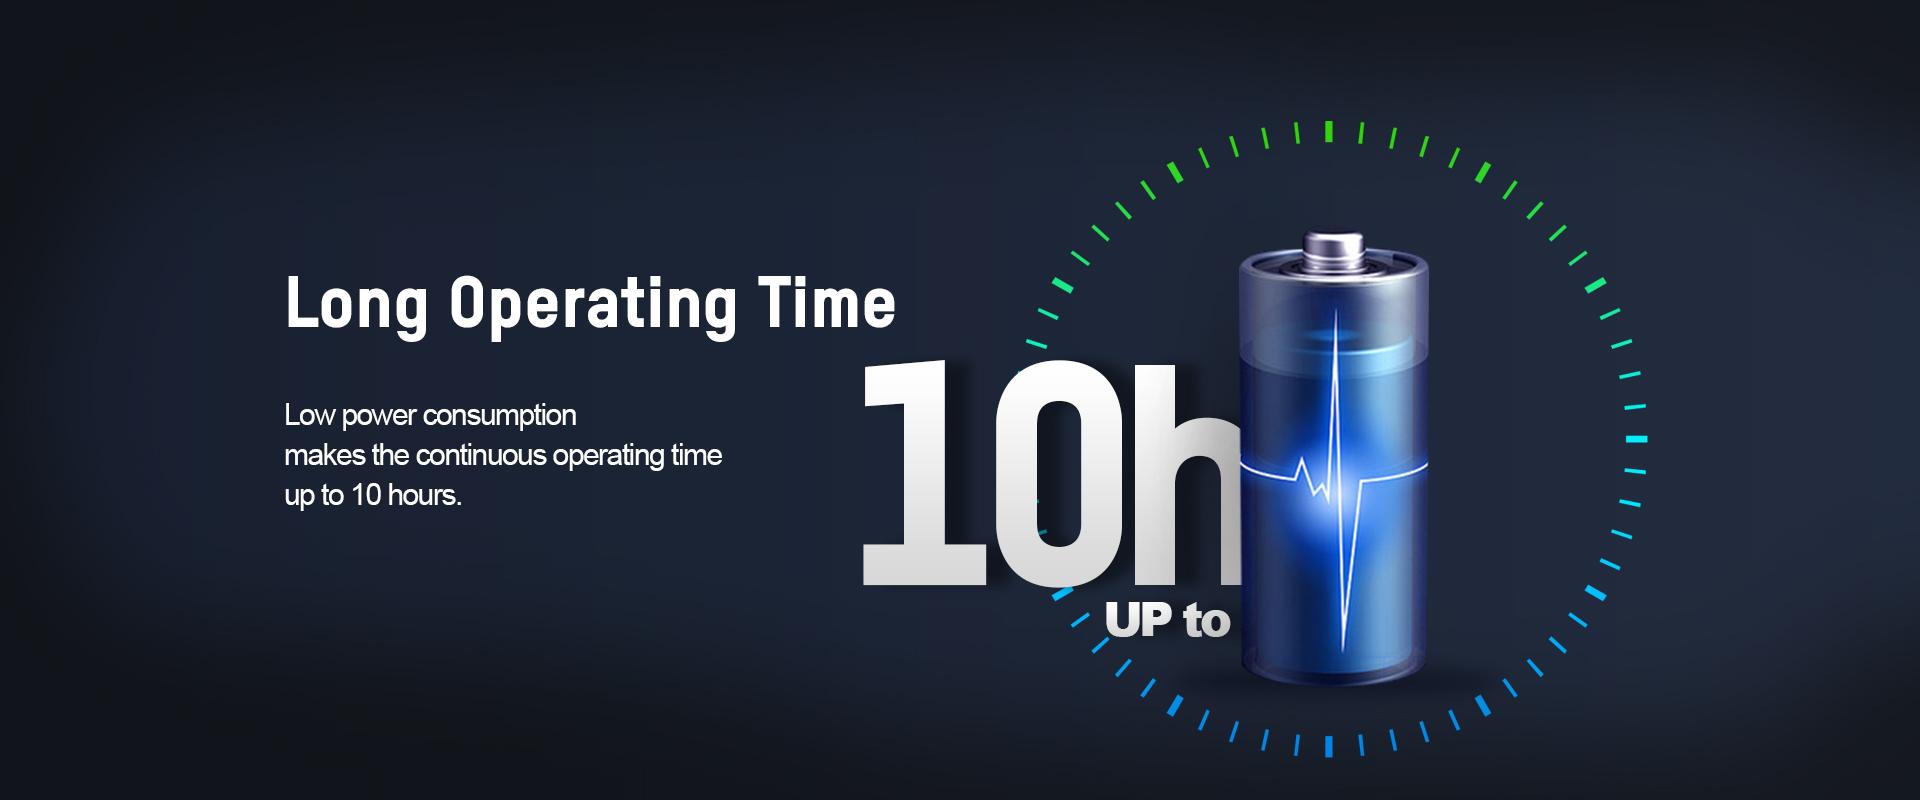 02-Long Operating Time_LYNX.jpg